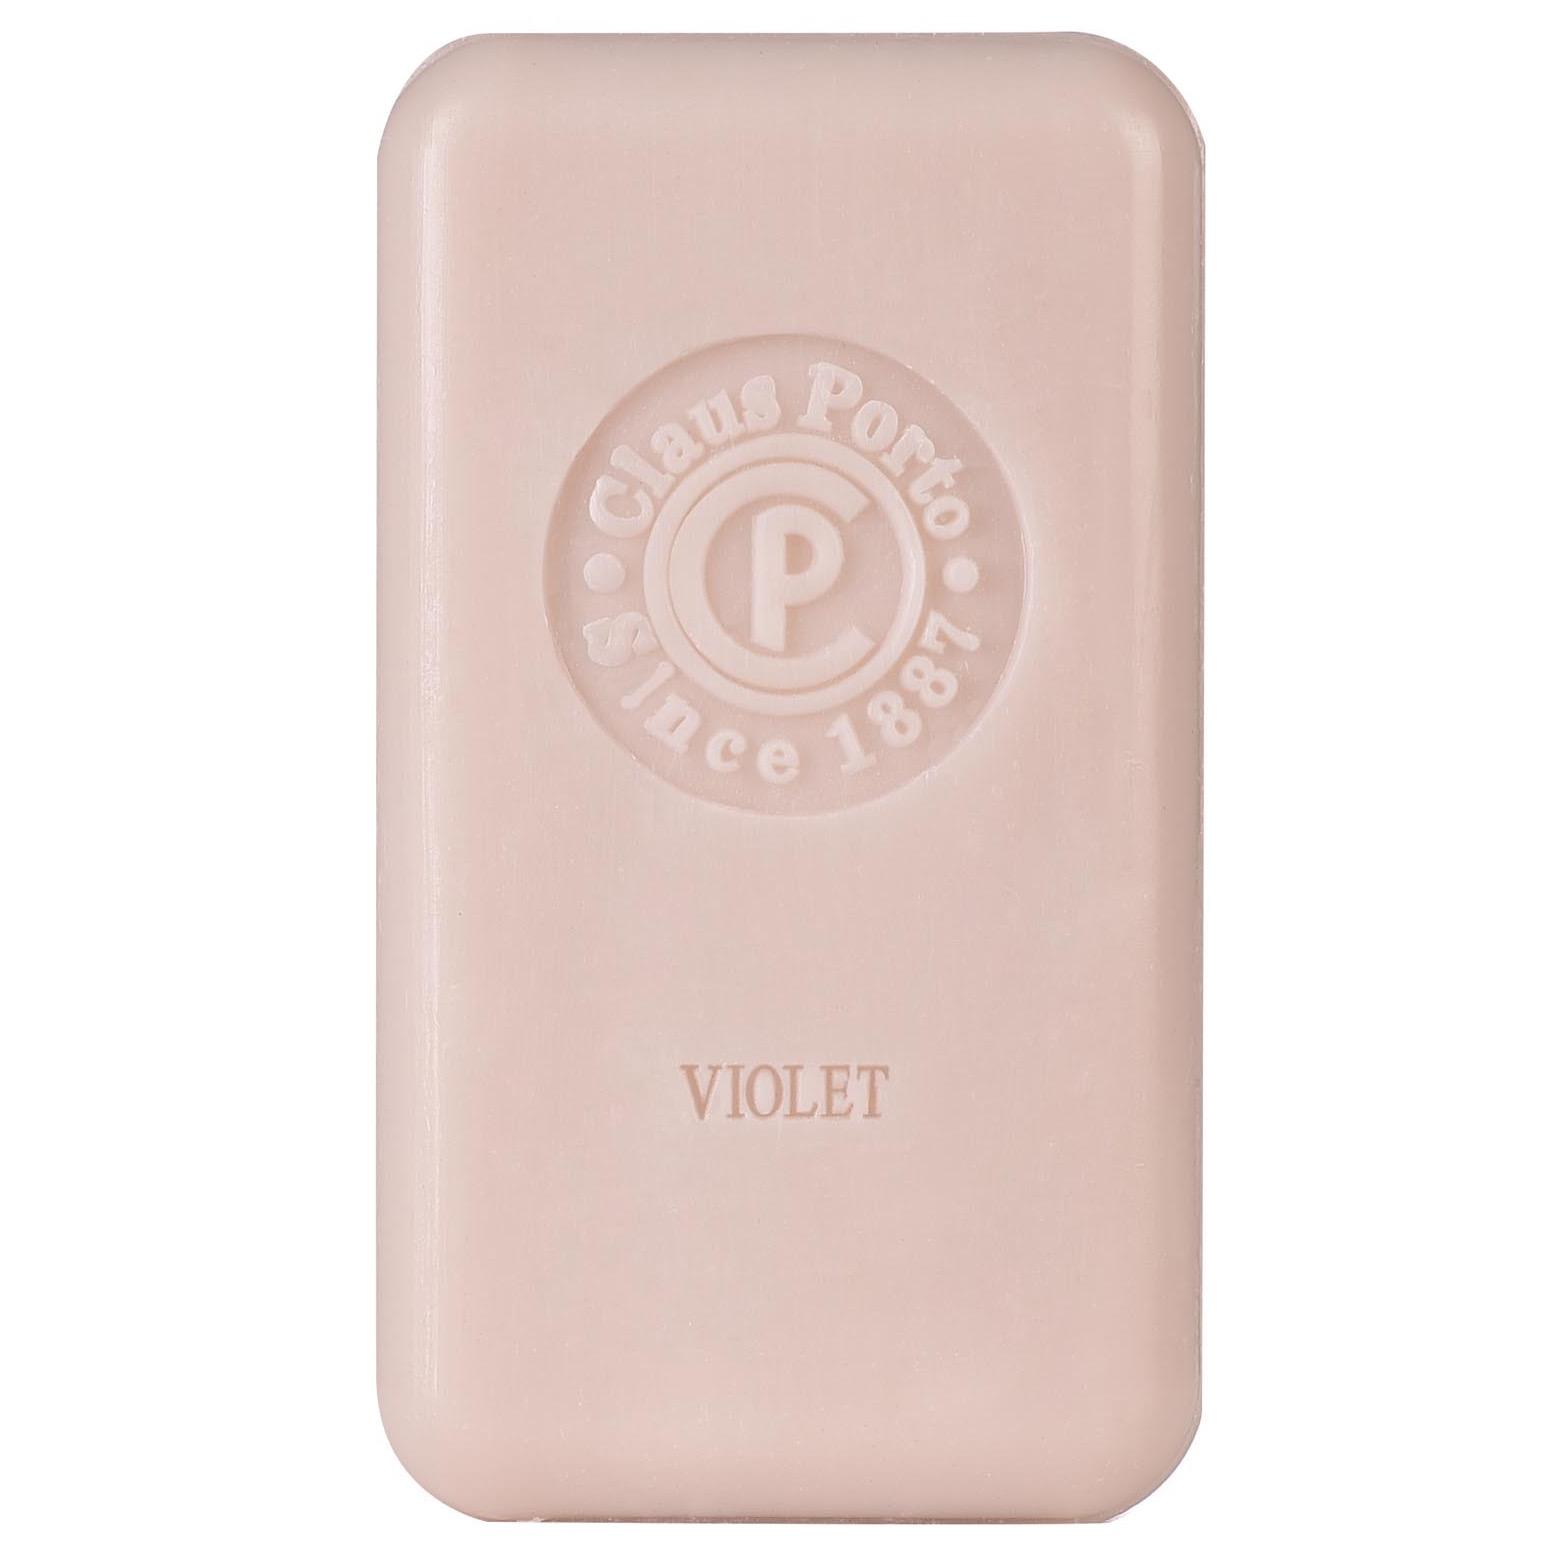 Soap Bar Fox Trot - Violet